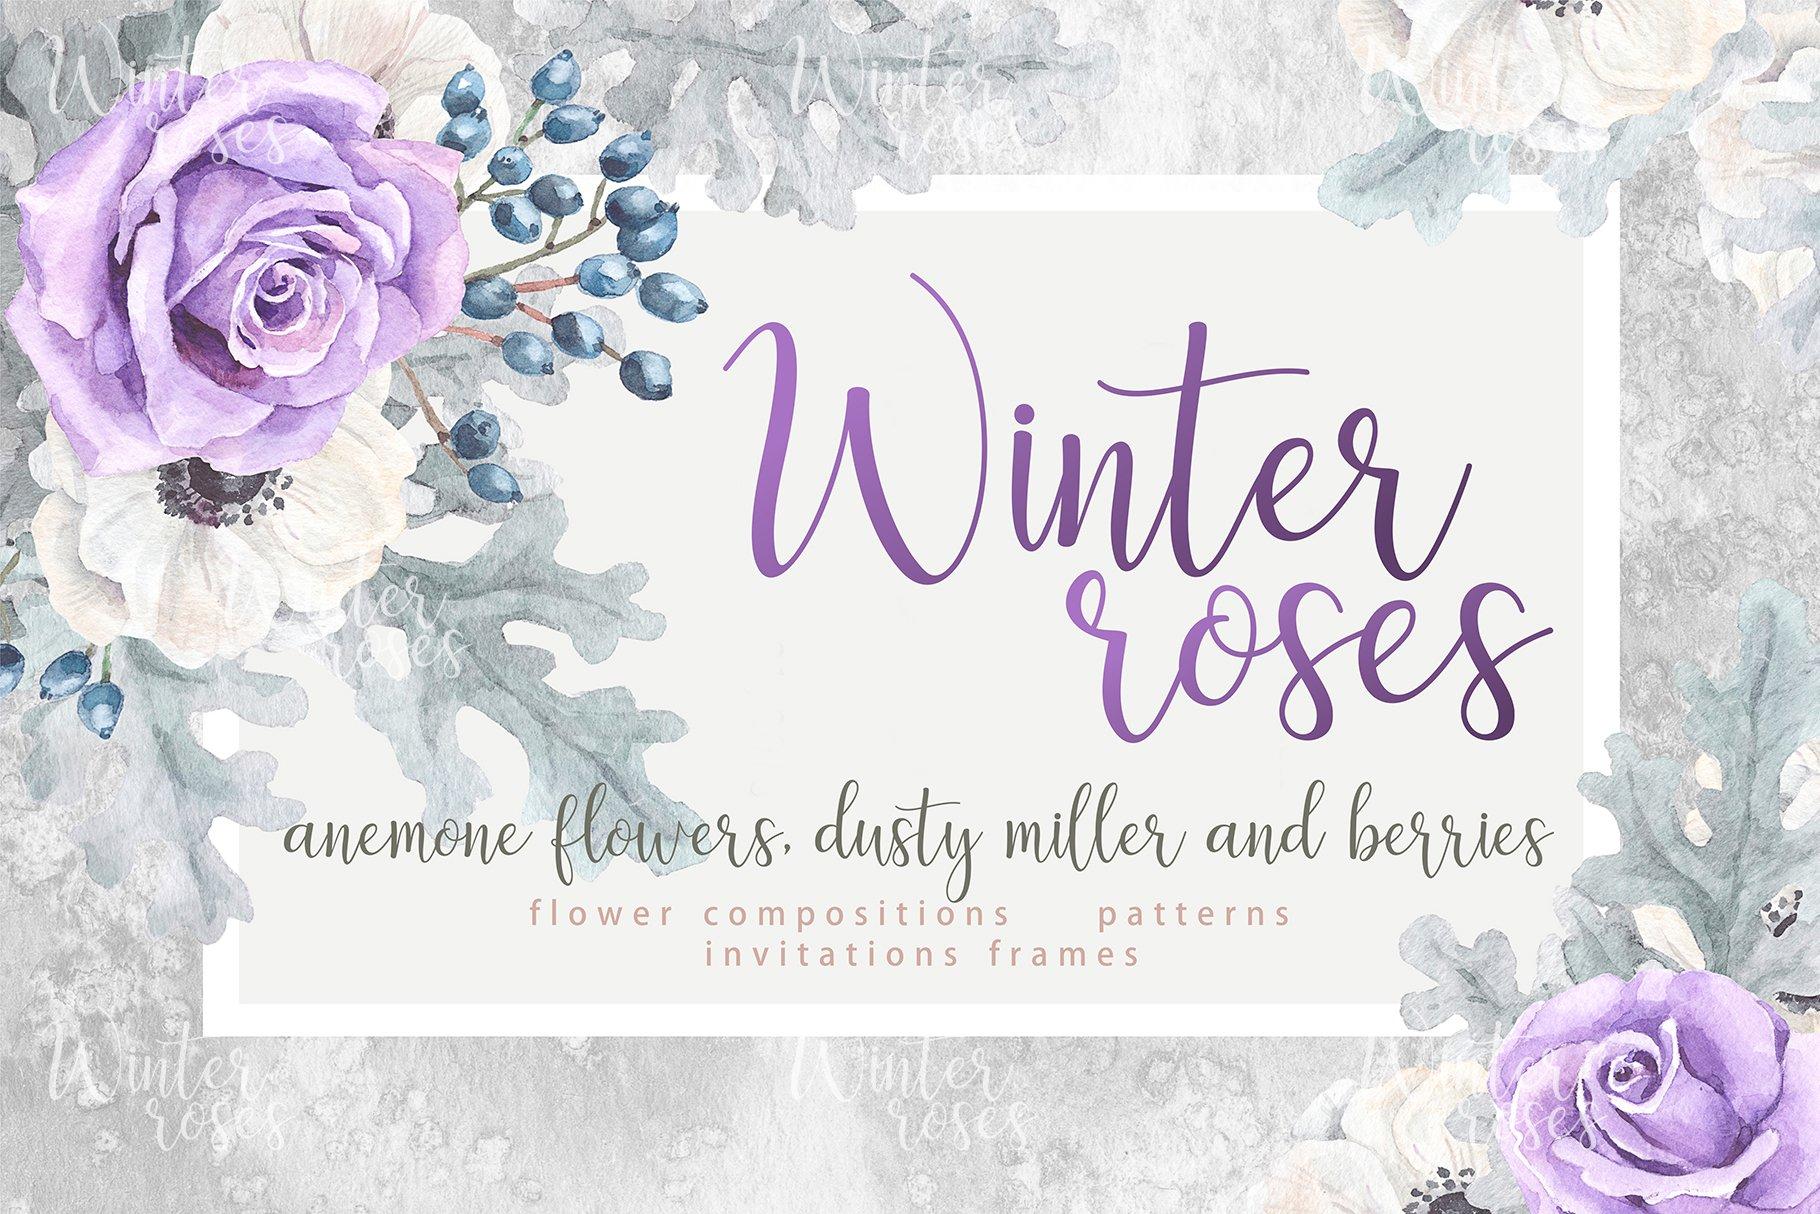 Watercolor roses wedding invitations ~ Illustrations ~ Creative Market